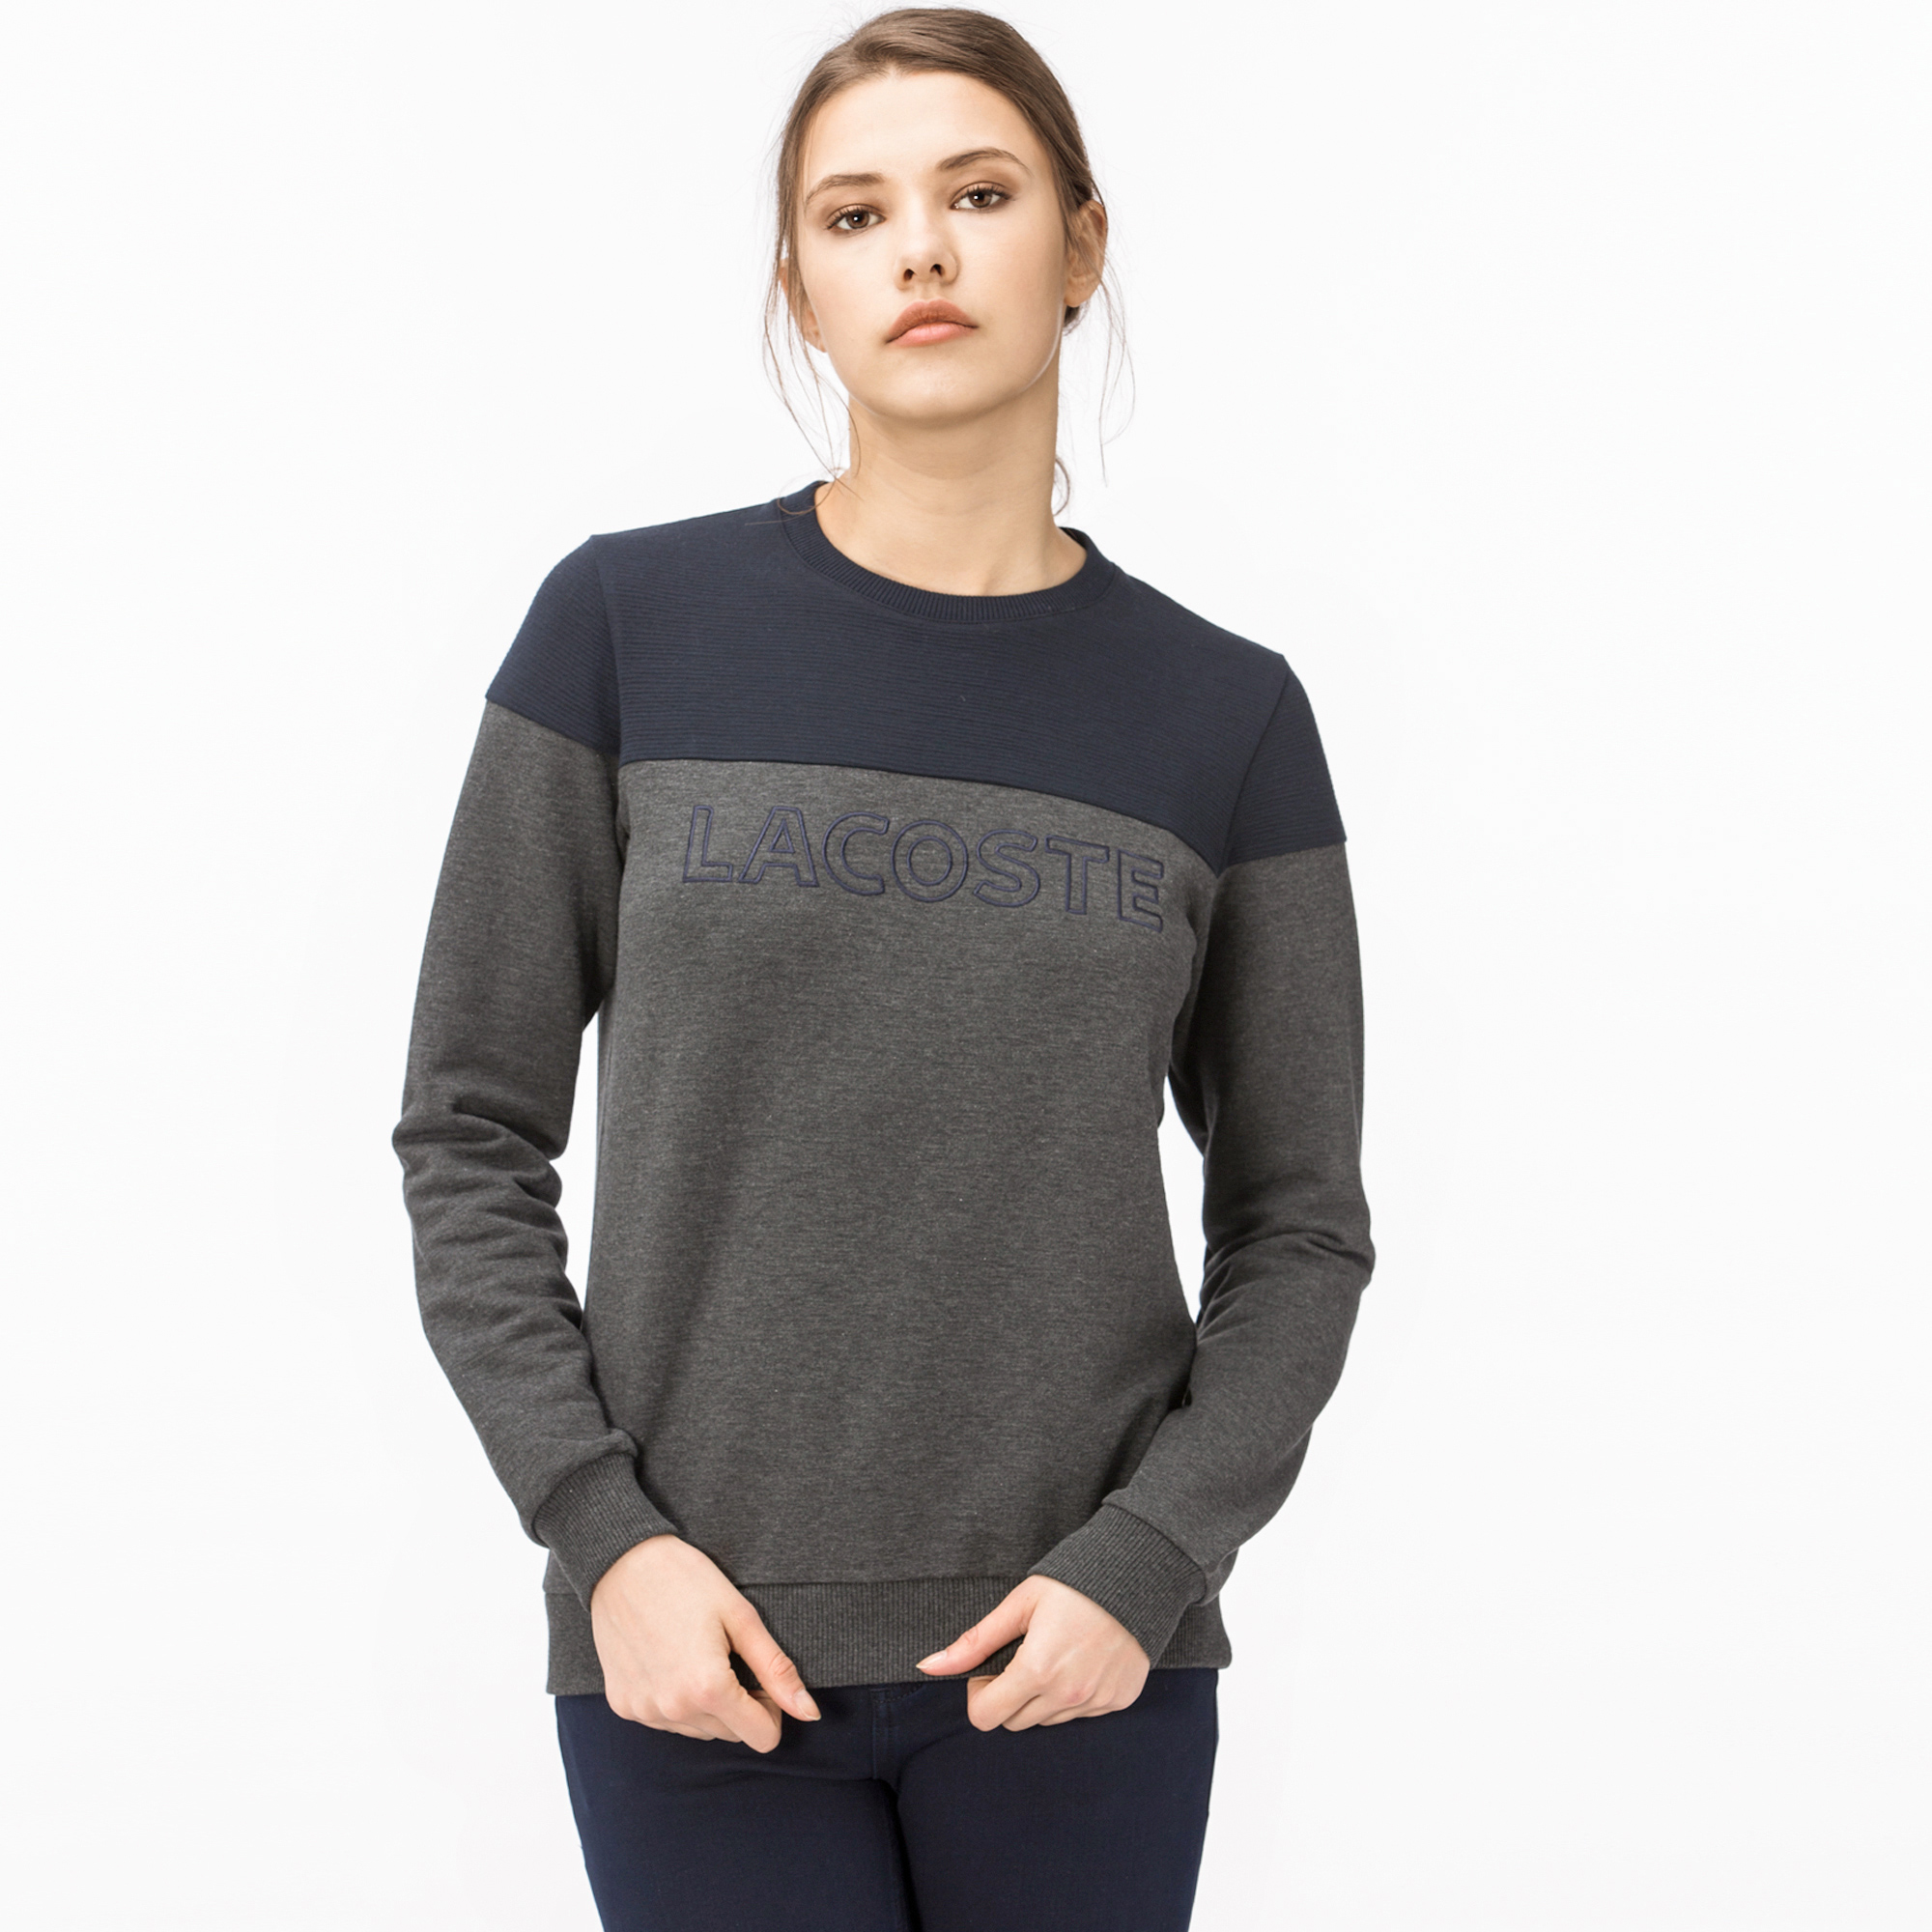 Lacoste Kadın Gri Lacivert Lacivert Lacoste Kadın Lacoste Lacivert Gri Sweatshirt Kadın Sweatshirt 0wO8NnPkX